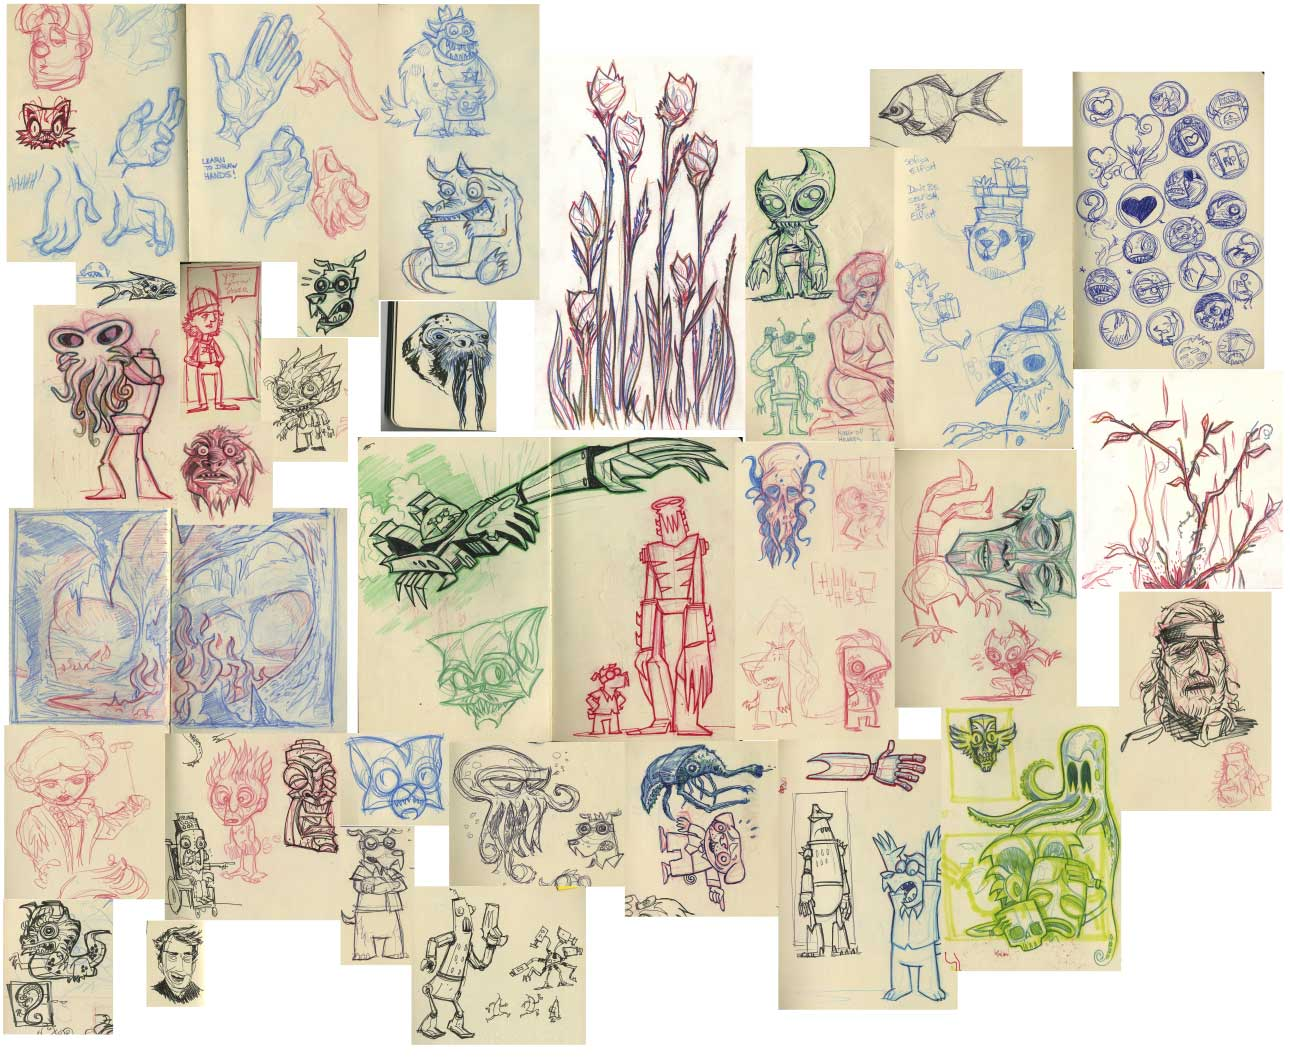 sketchbook-scans_414279122_o.jpg